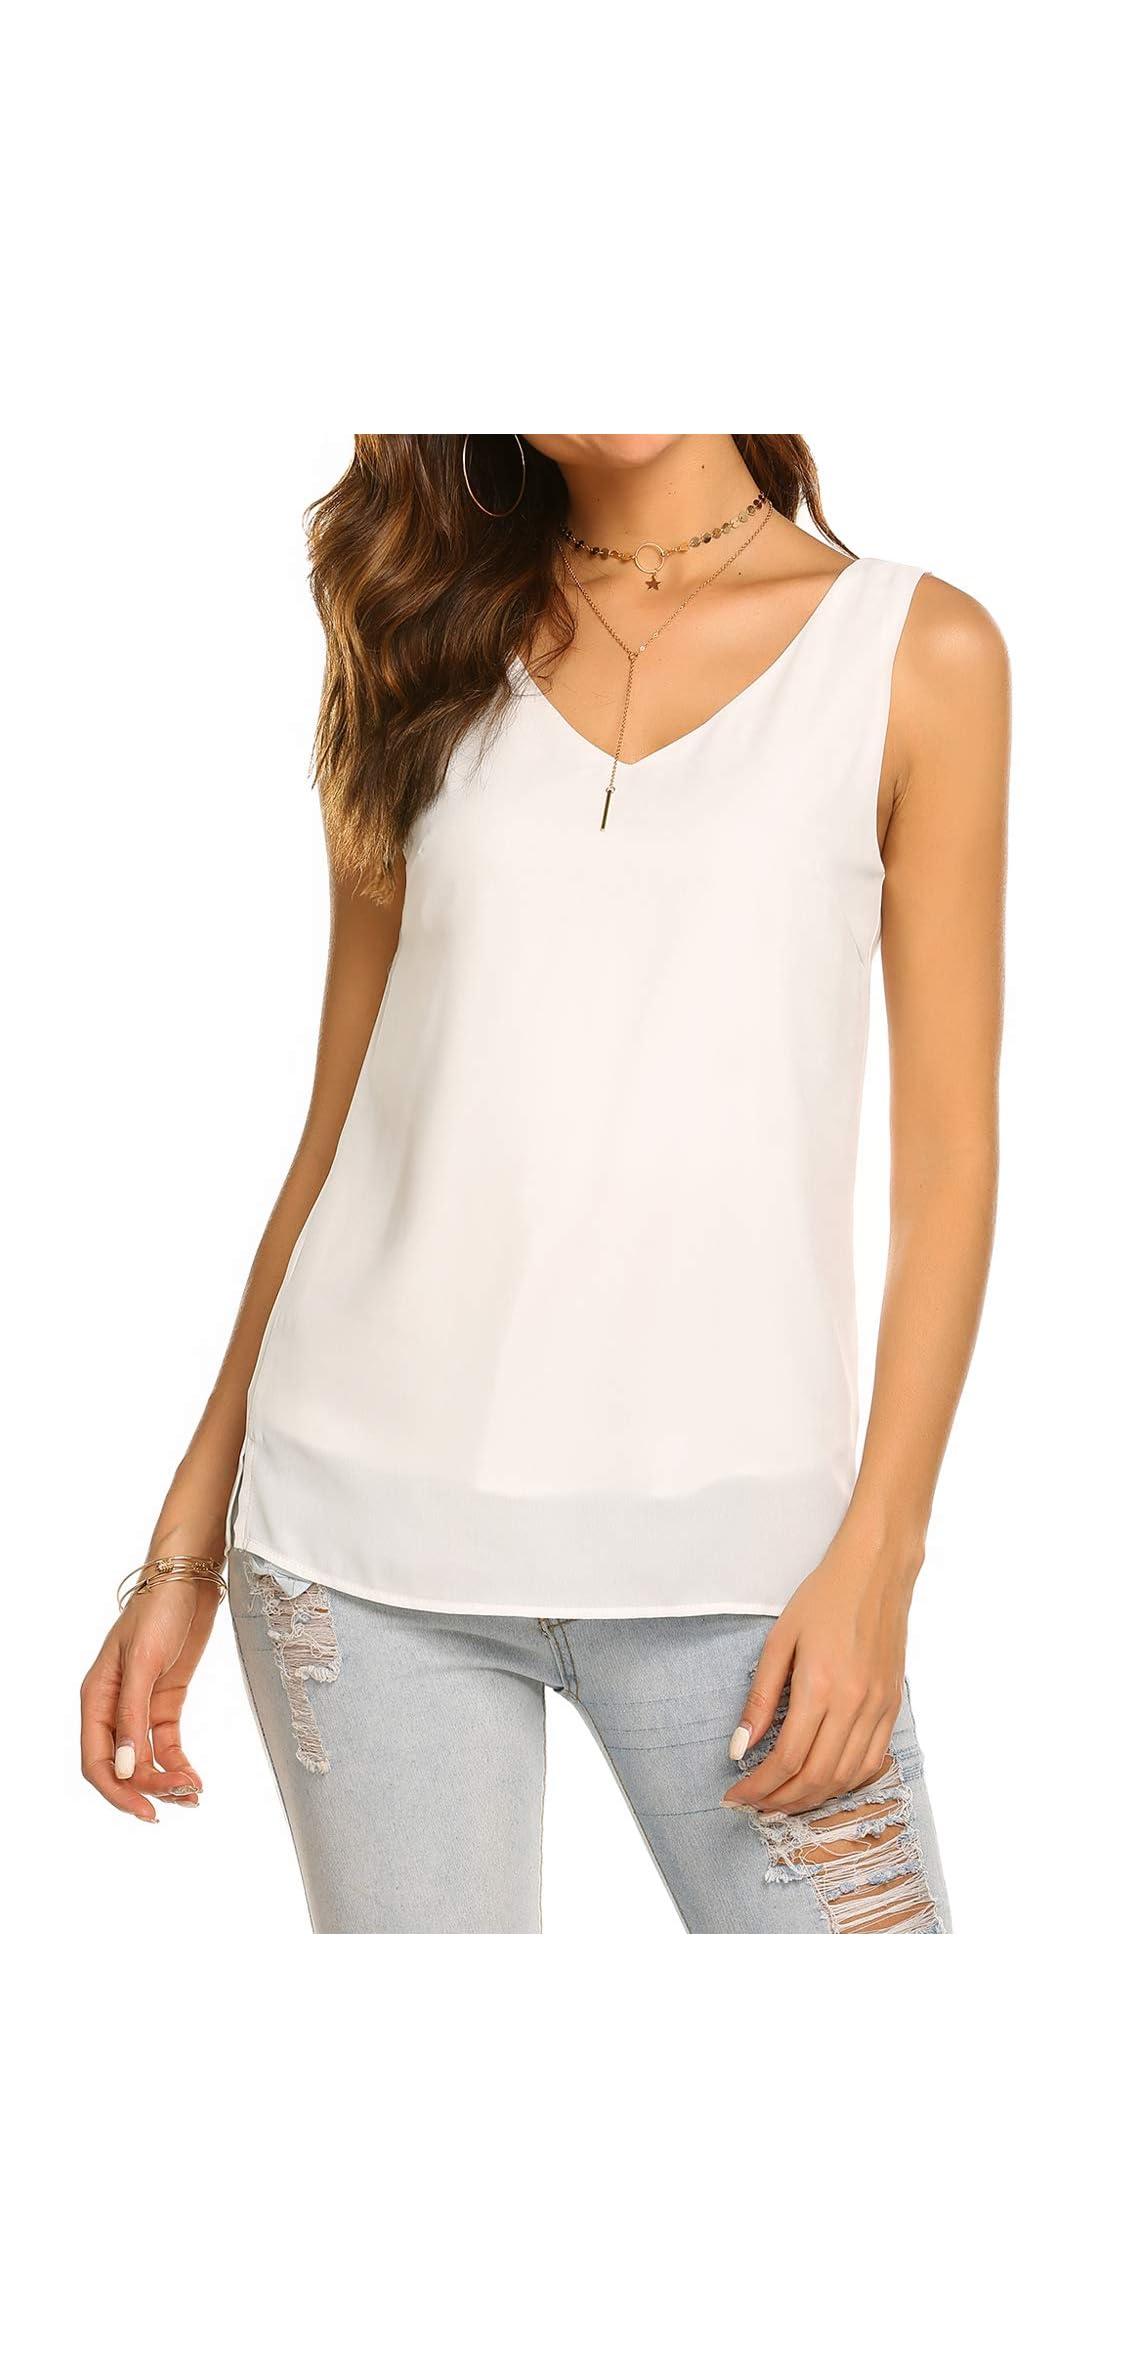 Women Summer Sleeveless Chiffon V Neck T Shirt Casual